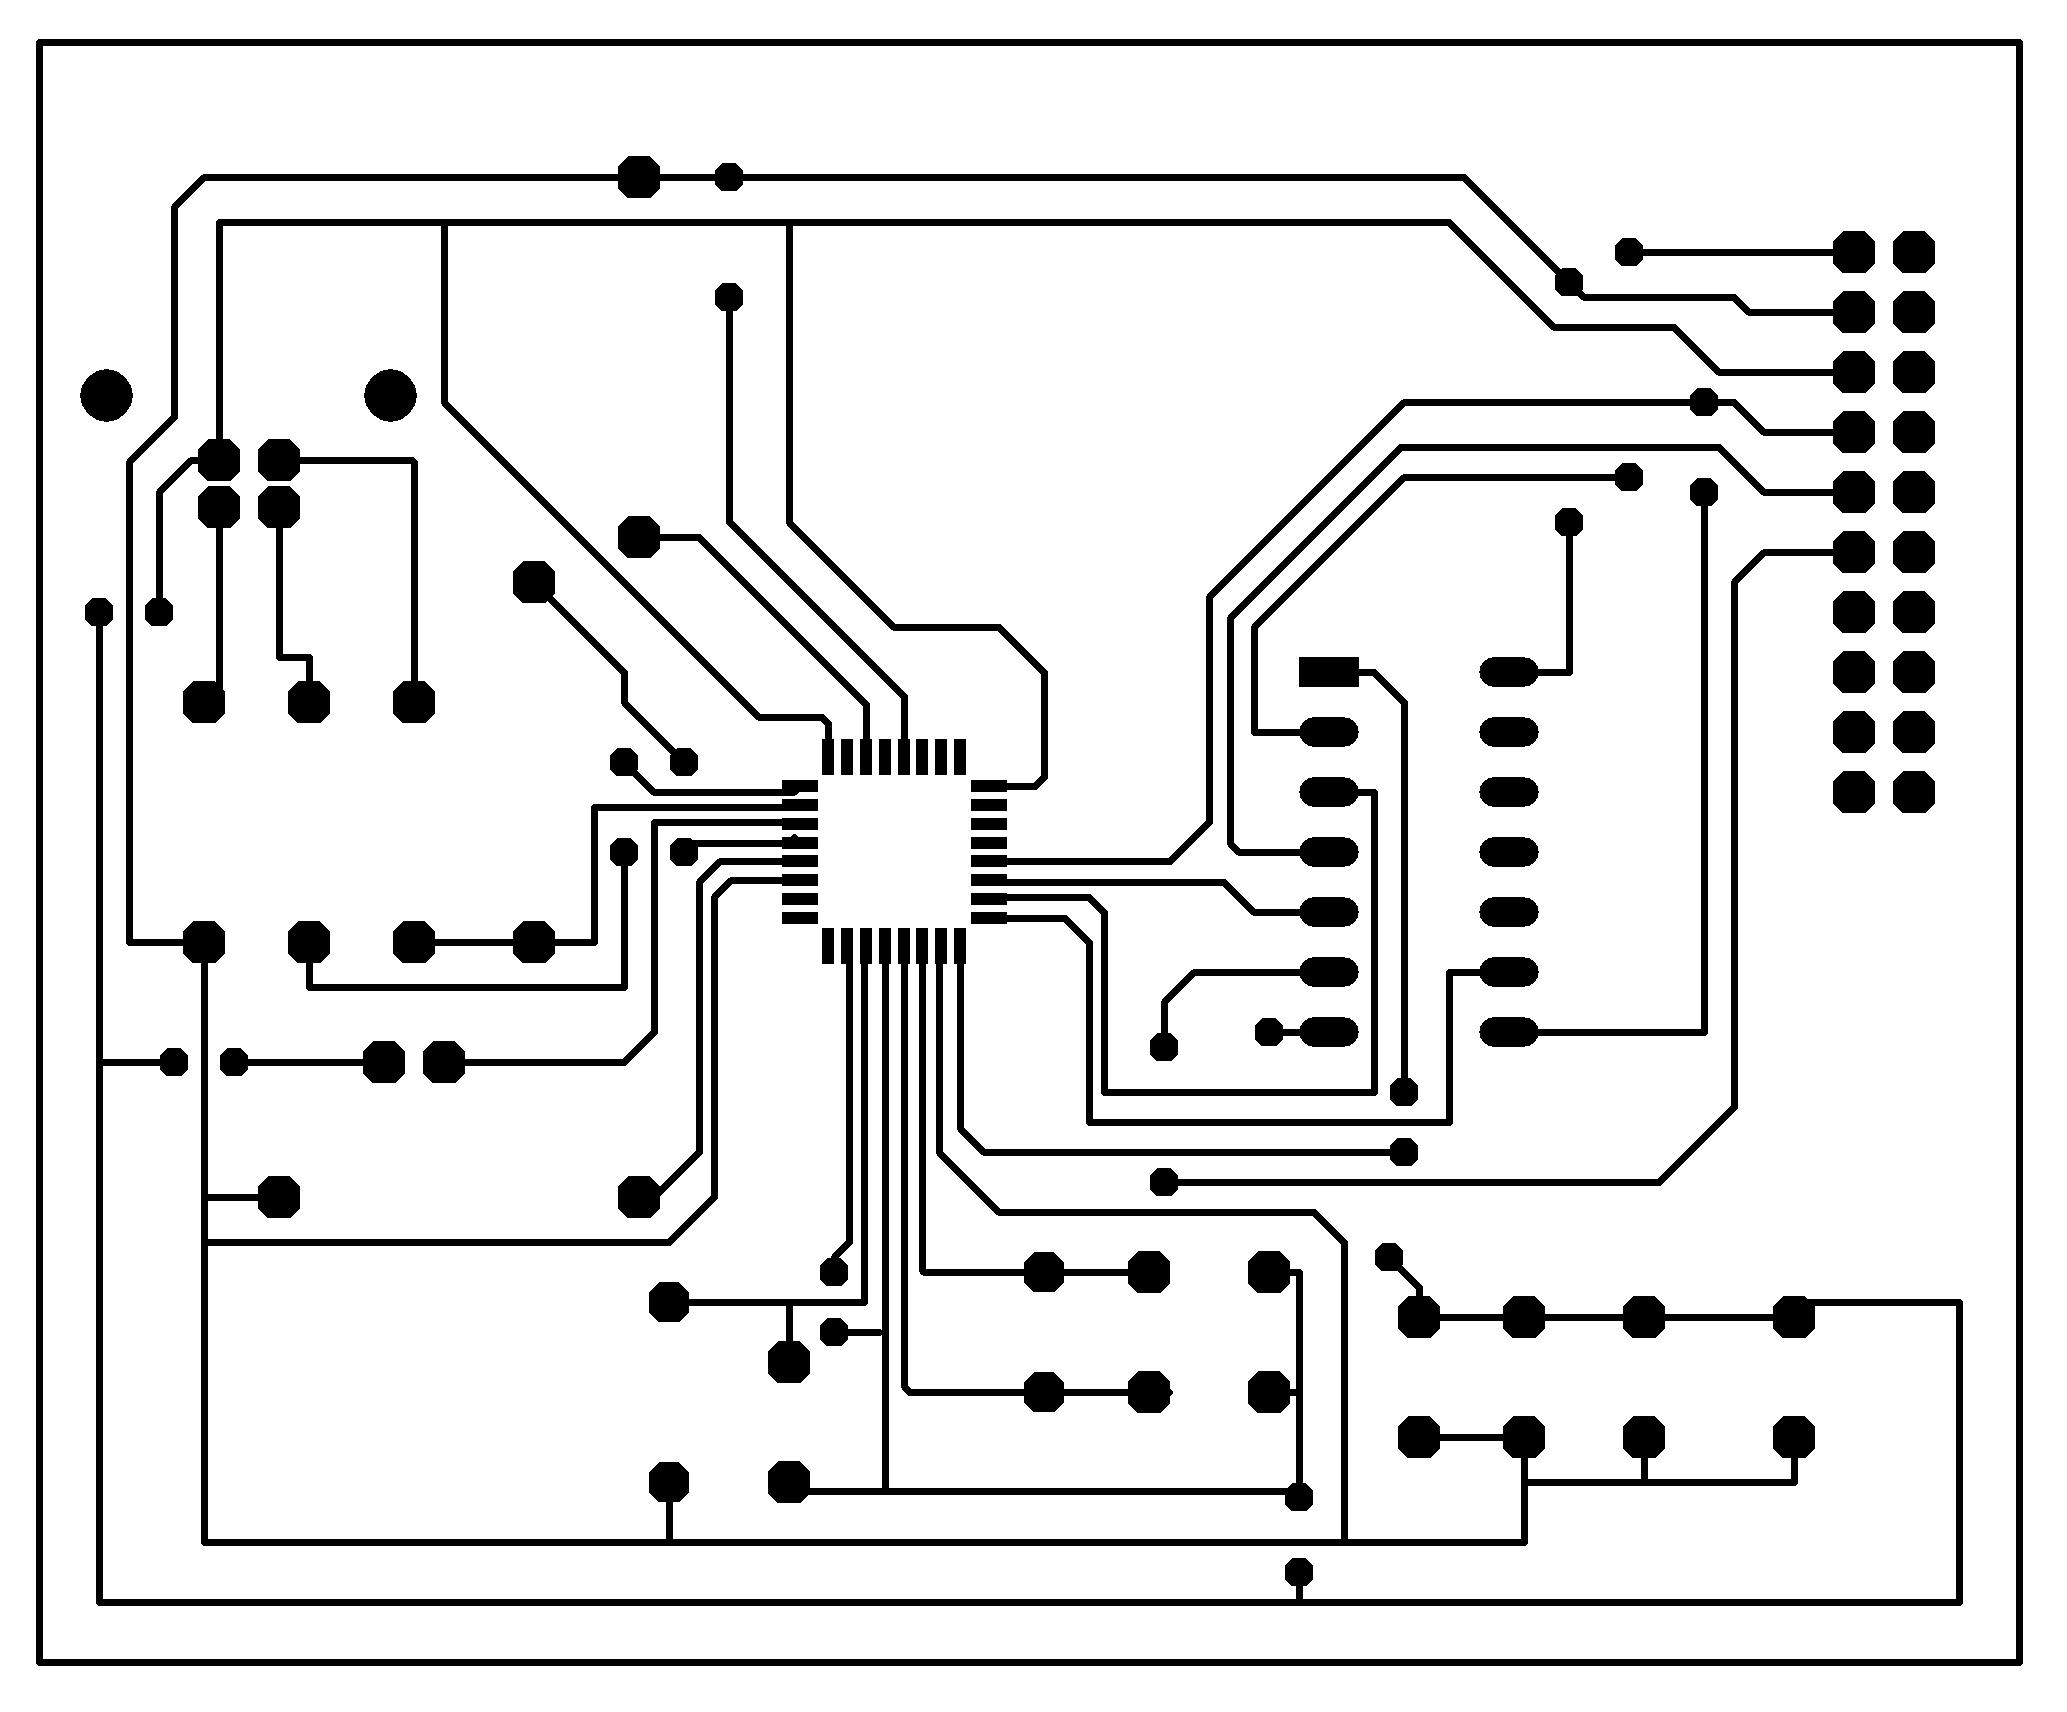 printed circuit board pcb layout